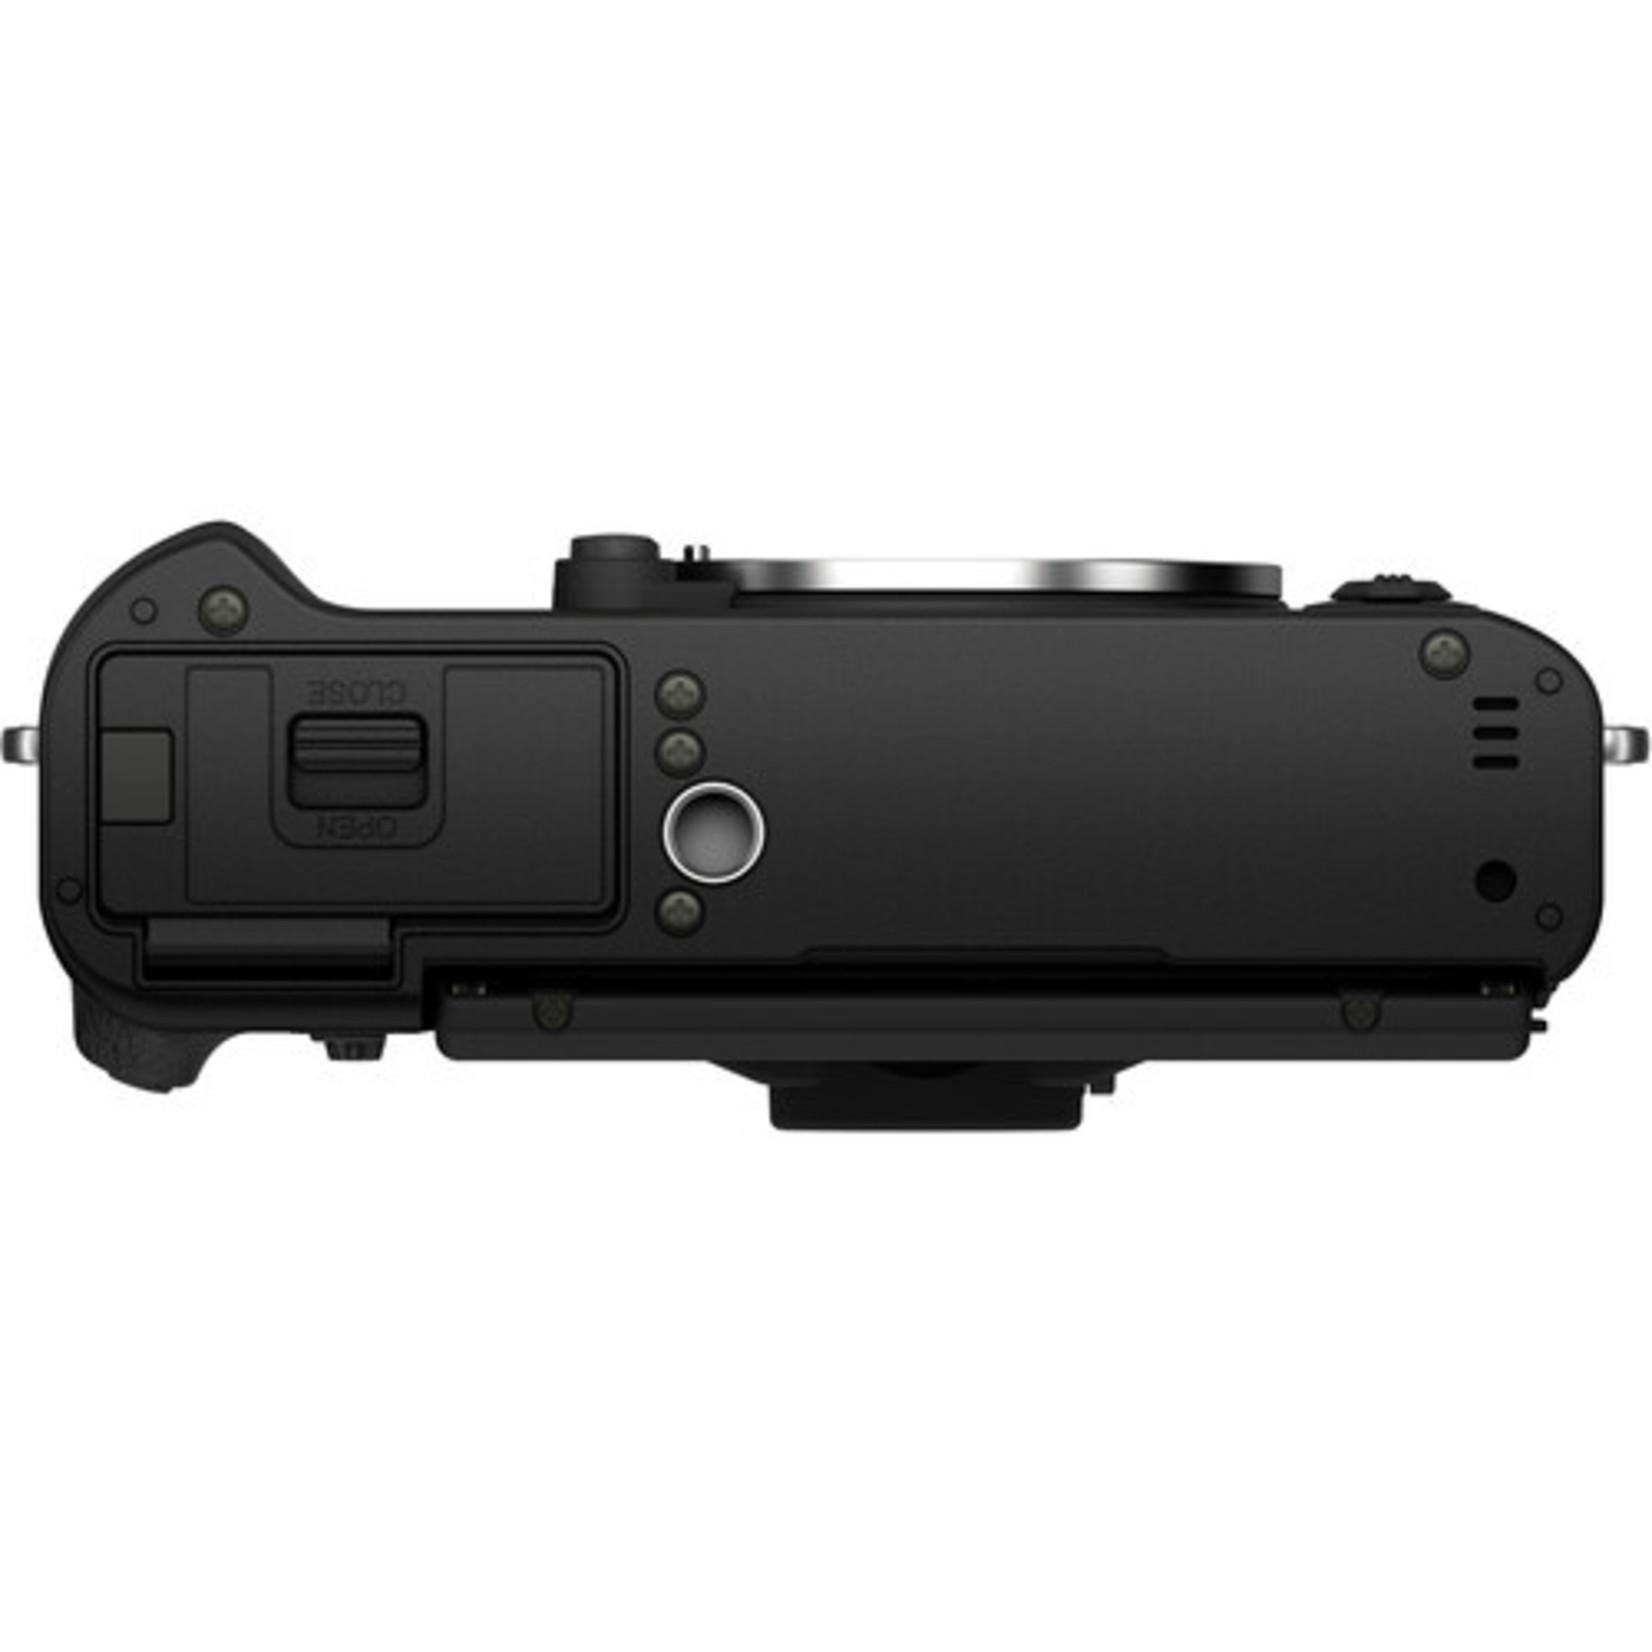 FujiFilm FUJIFILM X-T30 II Mirrorless Digital Camera with 18-55mm Lens (Black)